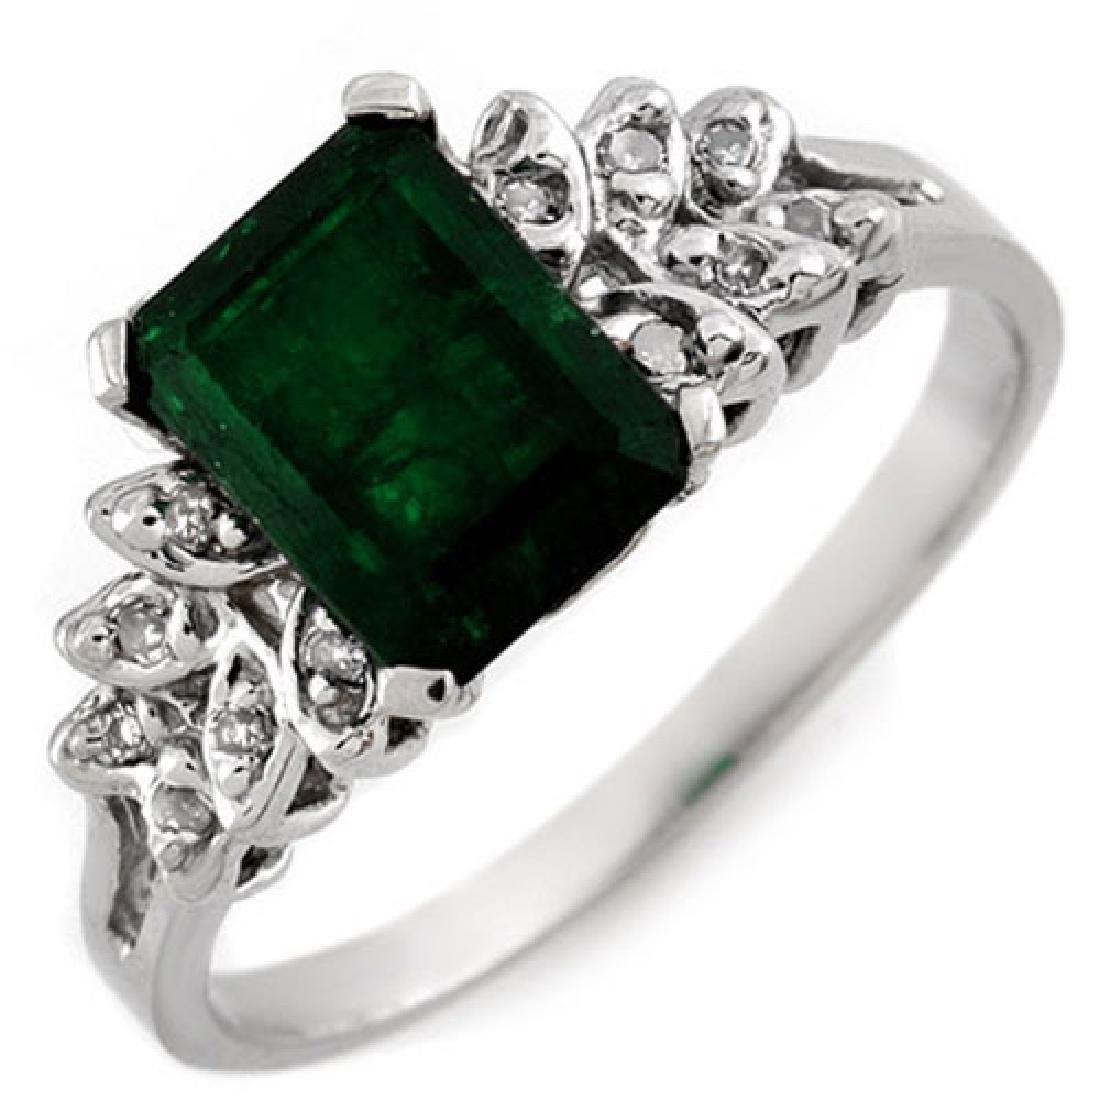 2.12 CTW Emerald & Diamond Ring 10K White Gold